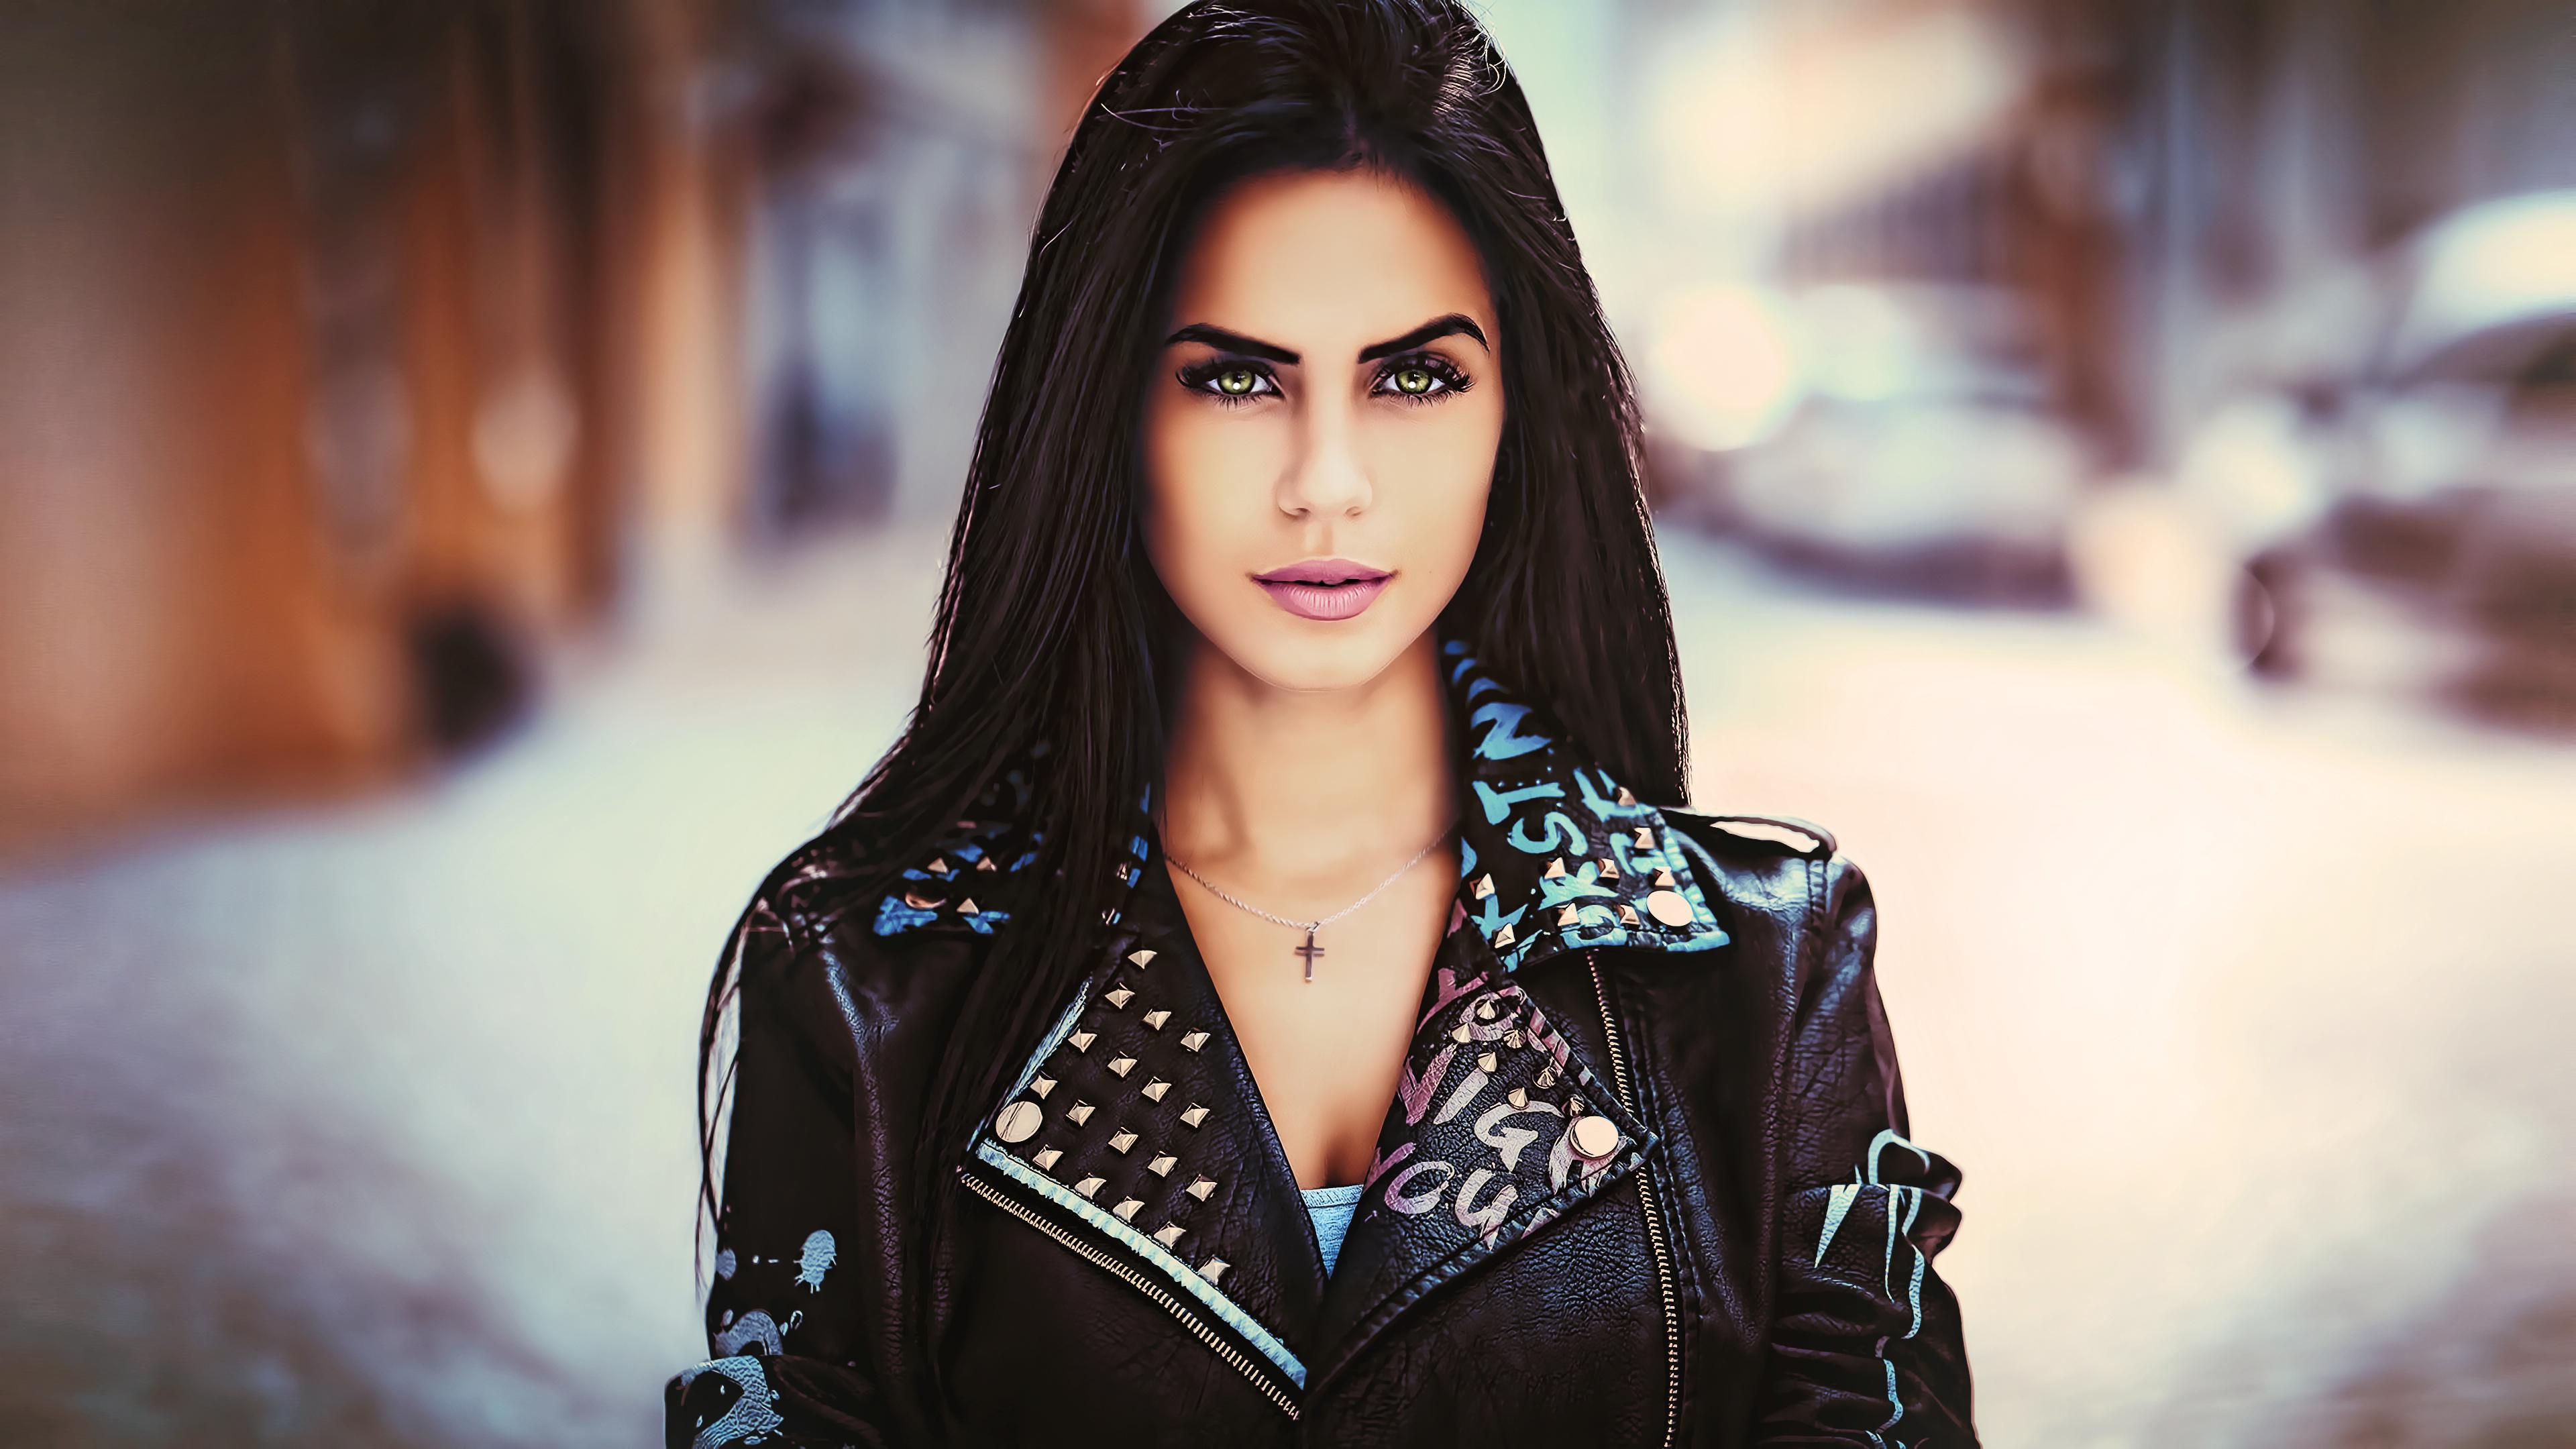 Milf Black Hair Green Eyes  Hot Girl Hd Wallpaper-6521